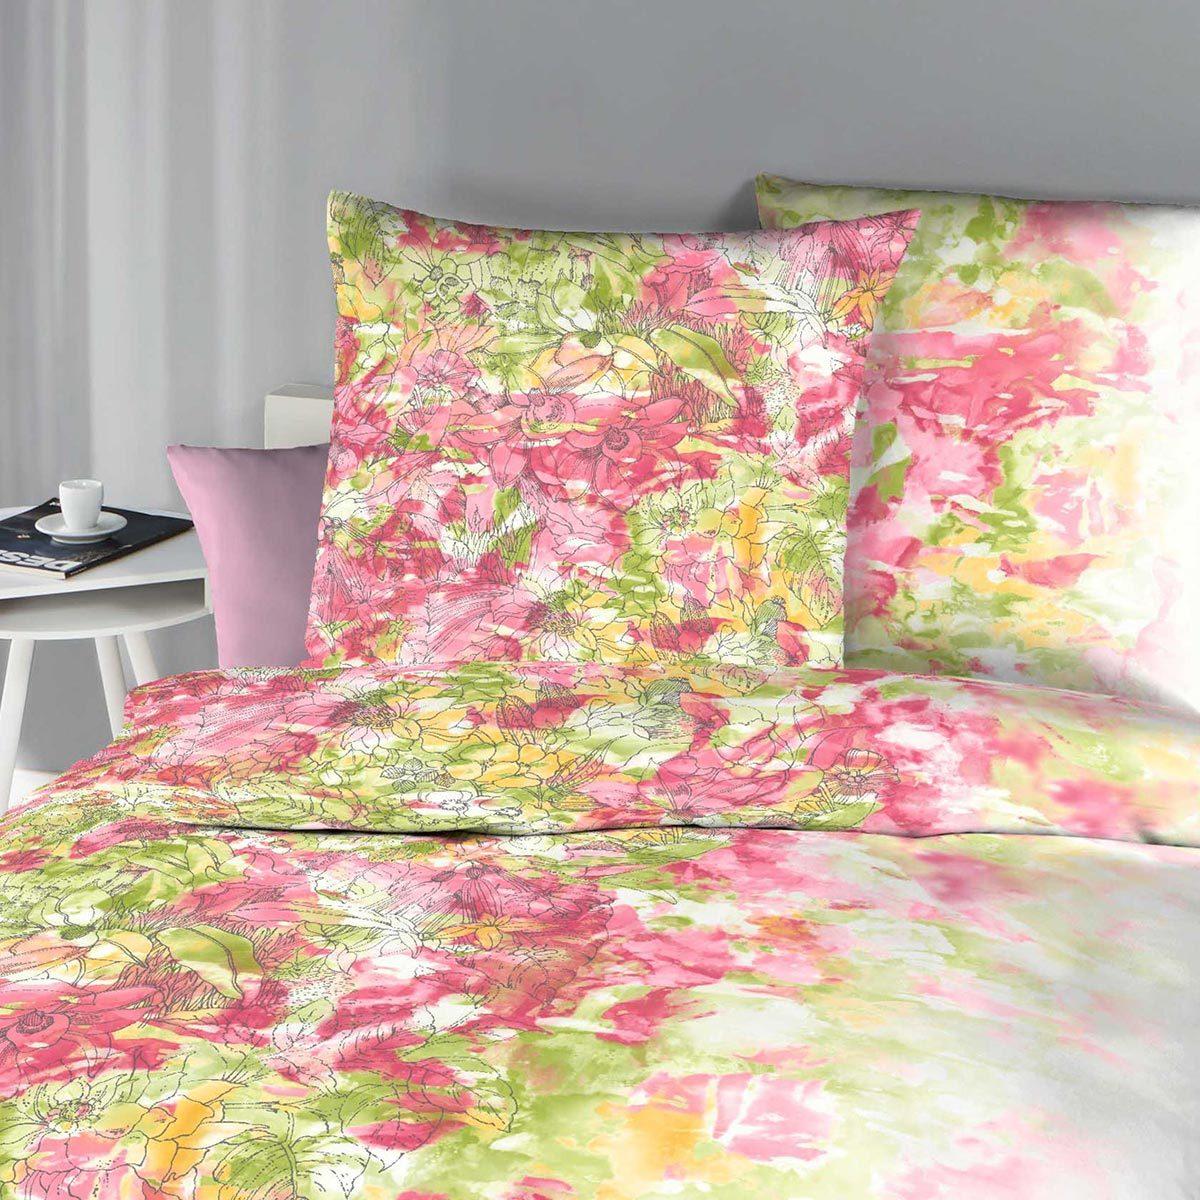 kaeppel mako satin bettw sche wild paradise bunt g nstig online kaufen bei bettwaren shop. Black Bedroom Furniture Sets. Home Design Ideas